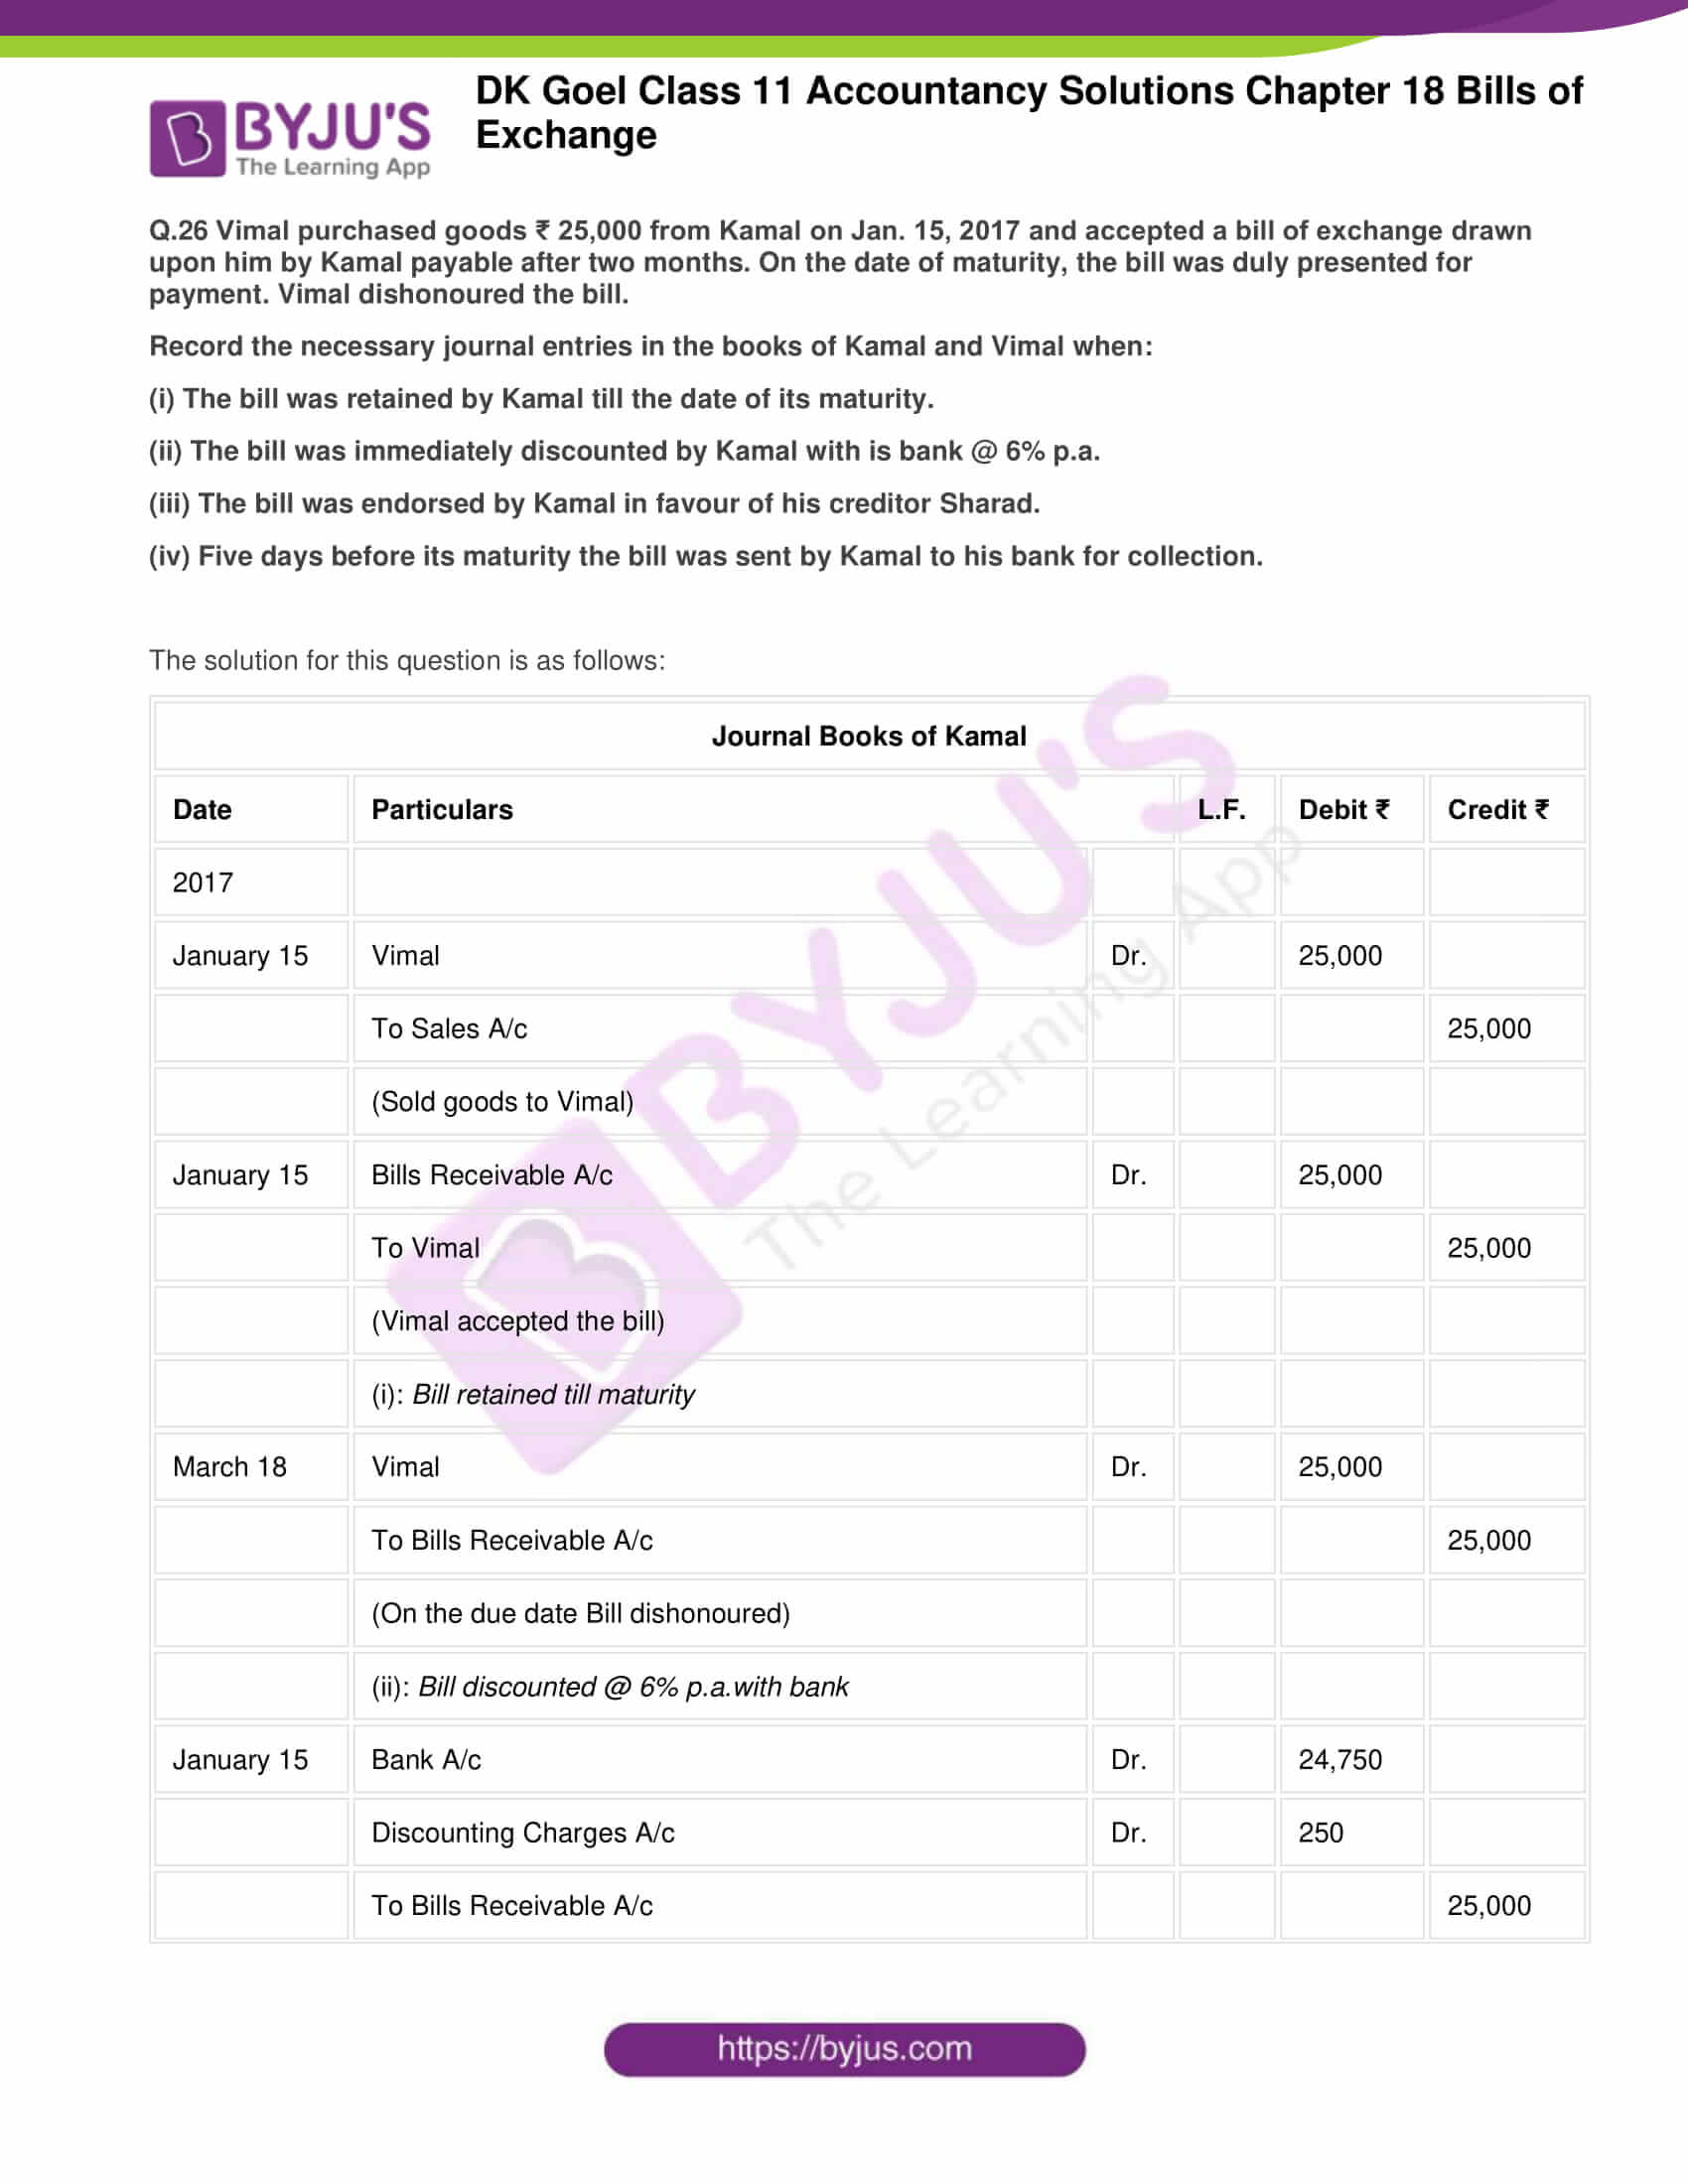 dk goel class 11 accountancy solutions chapter 18 062